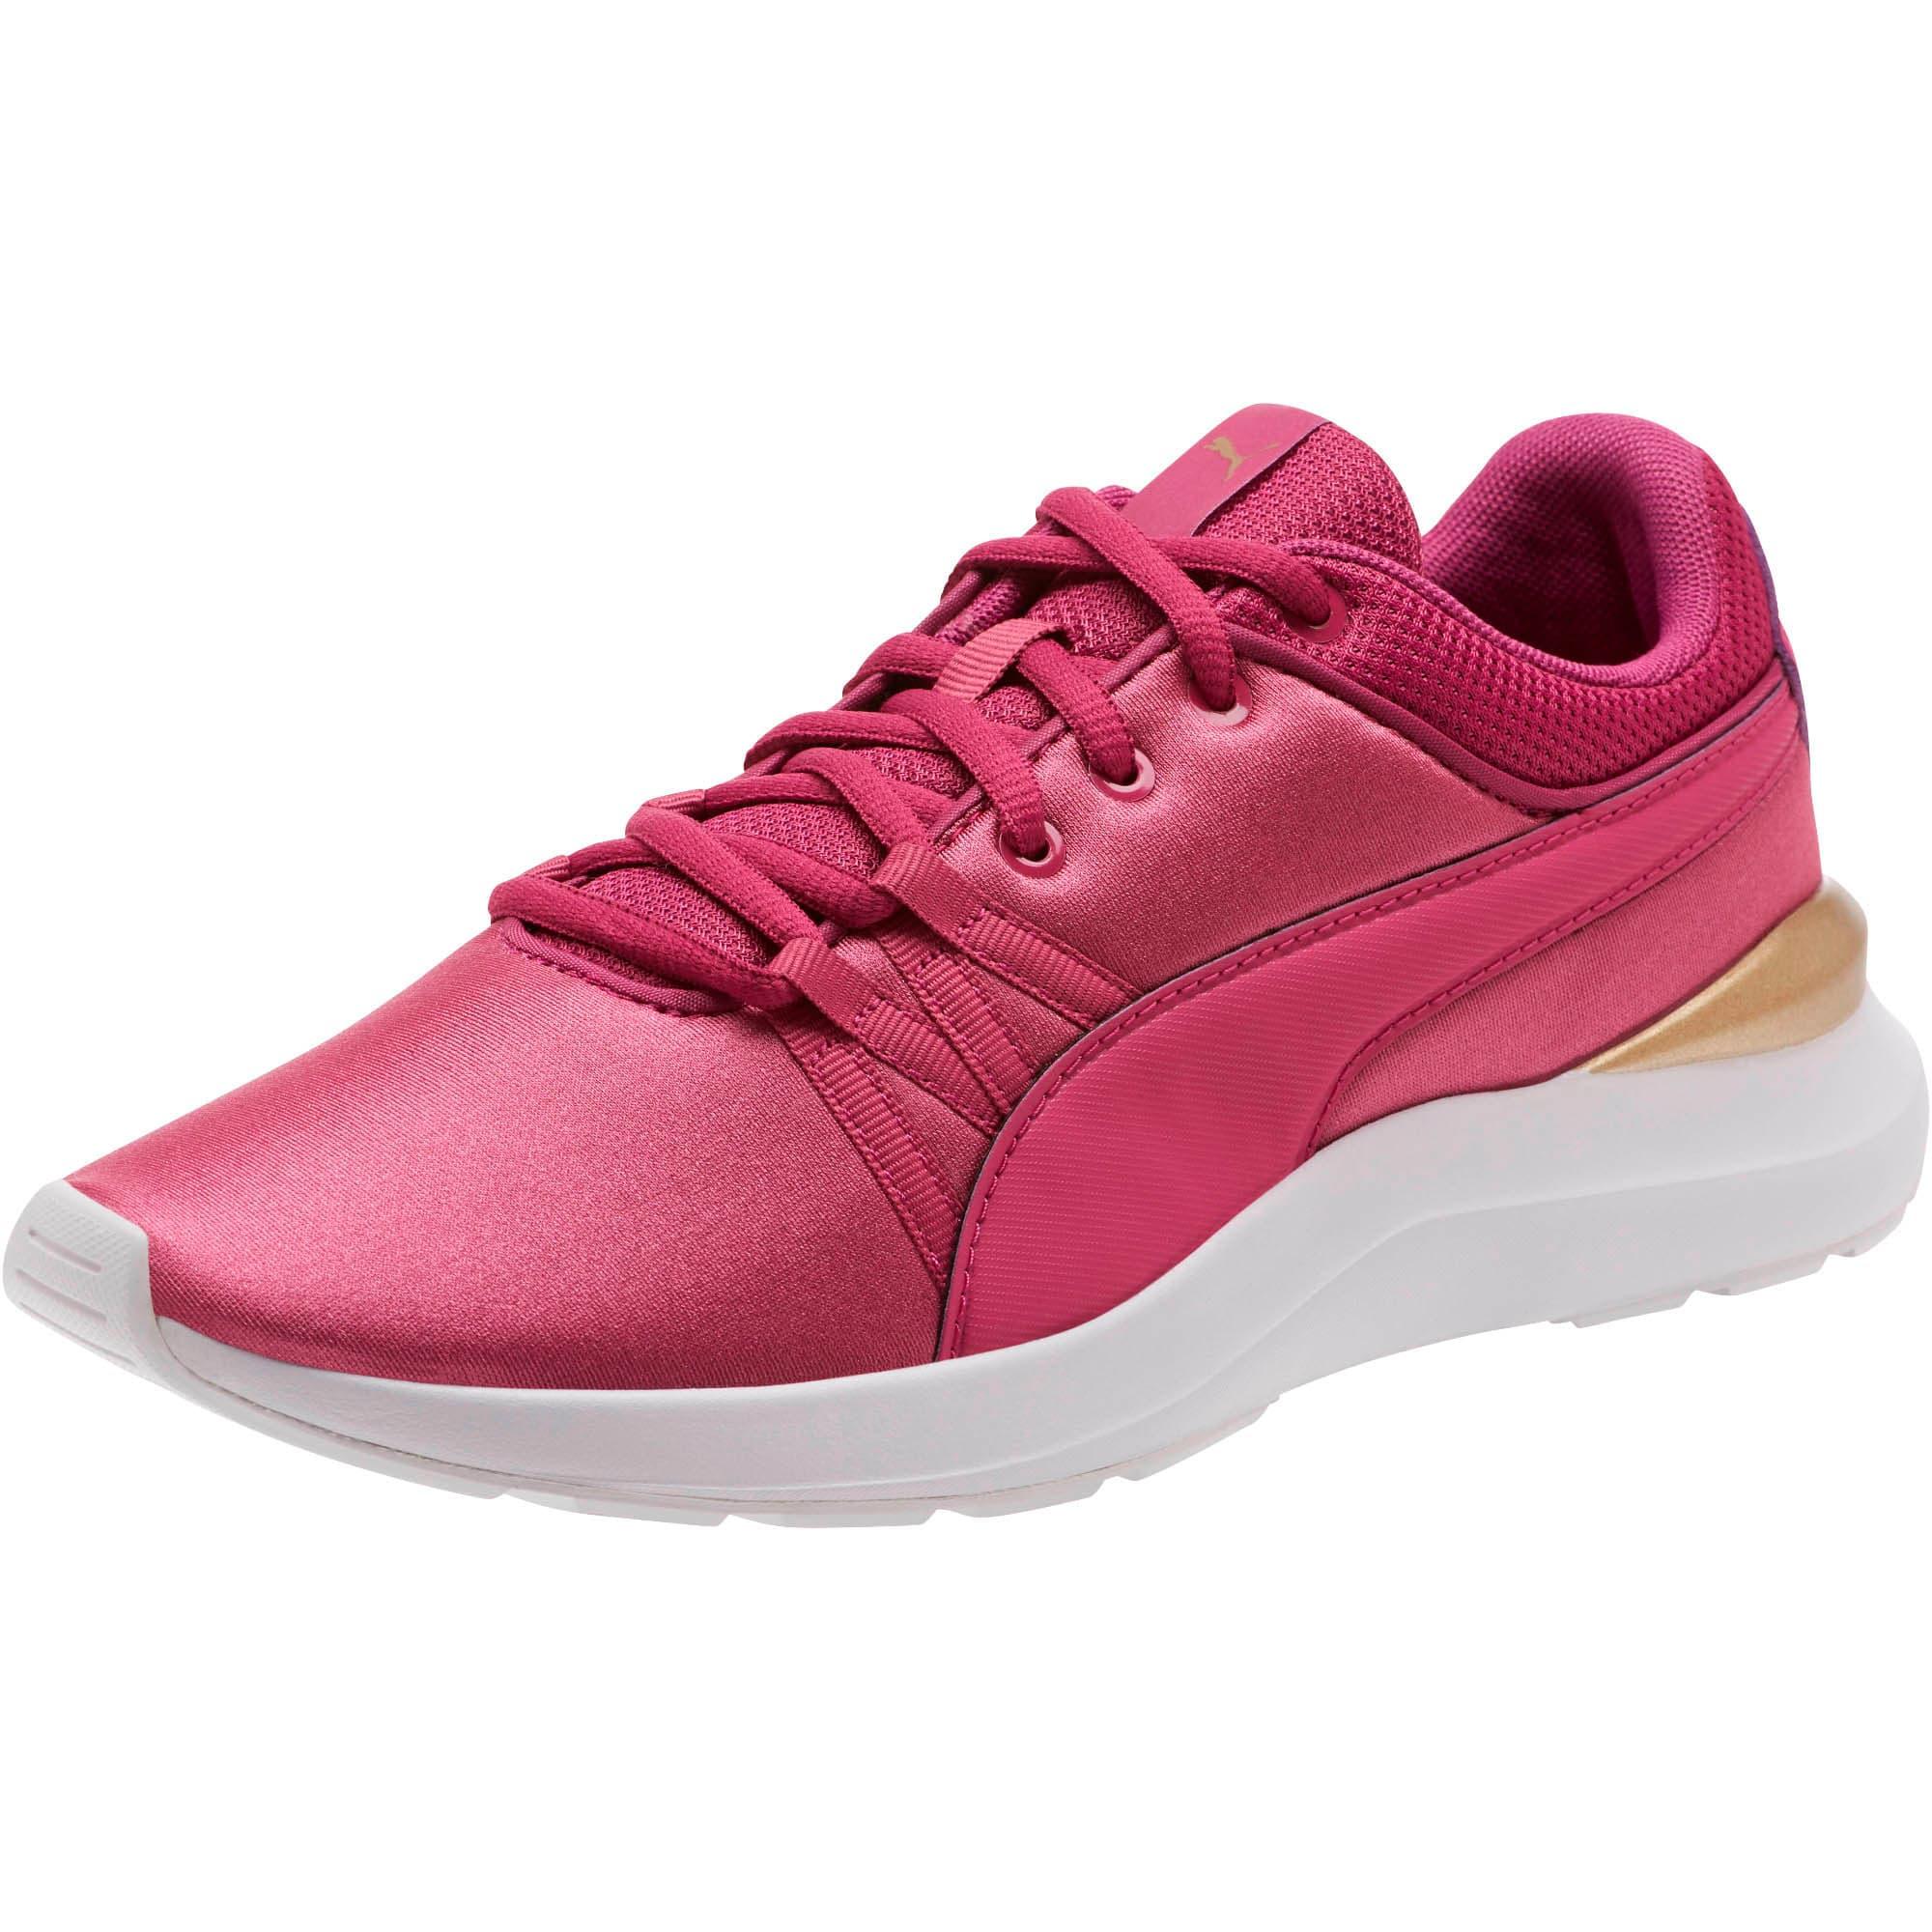 Thumbnail 1 of Adela Women's Sneakers, Magenta Haze-Magenta Haze, medium